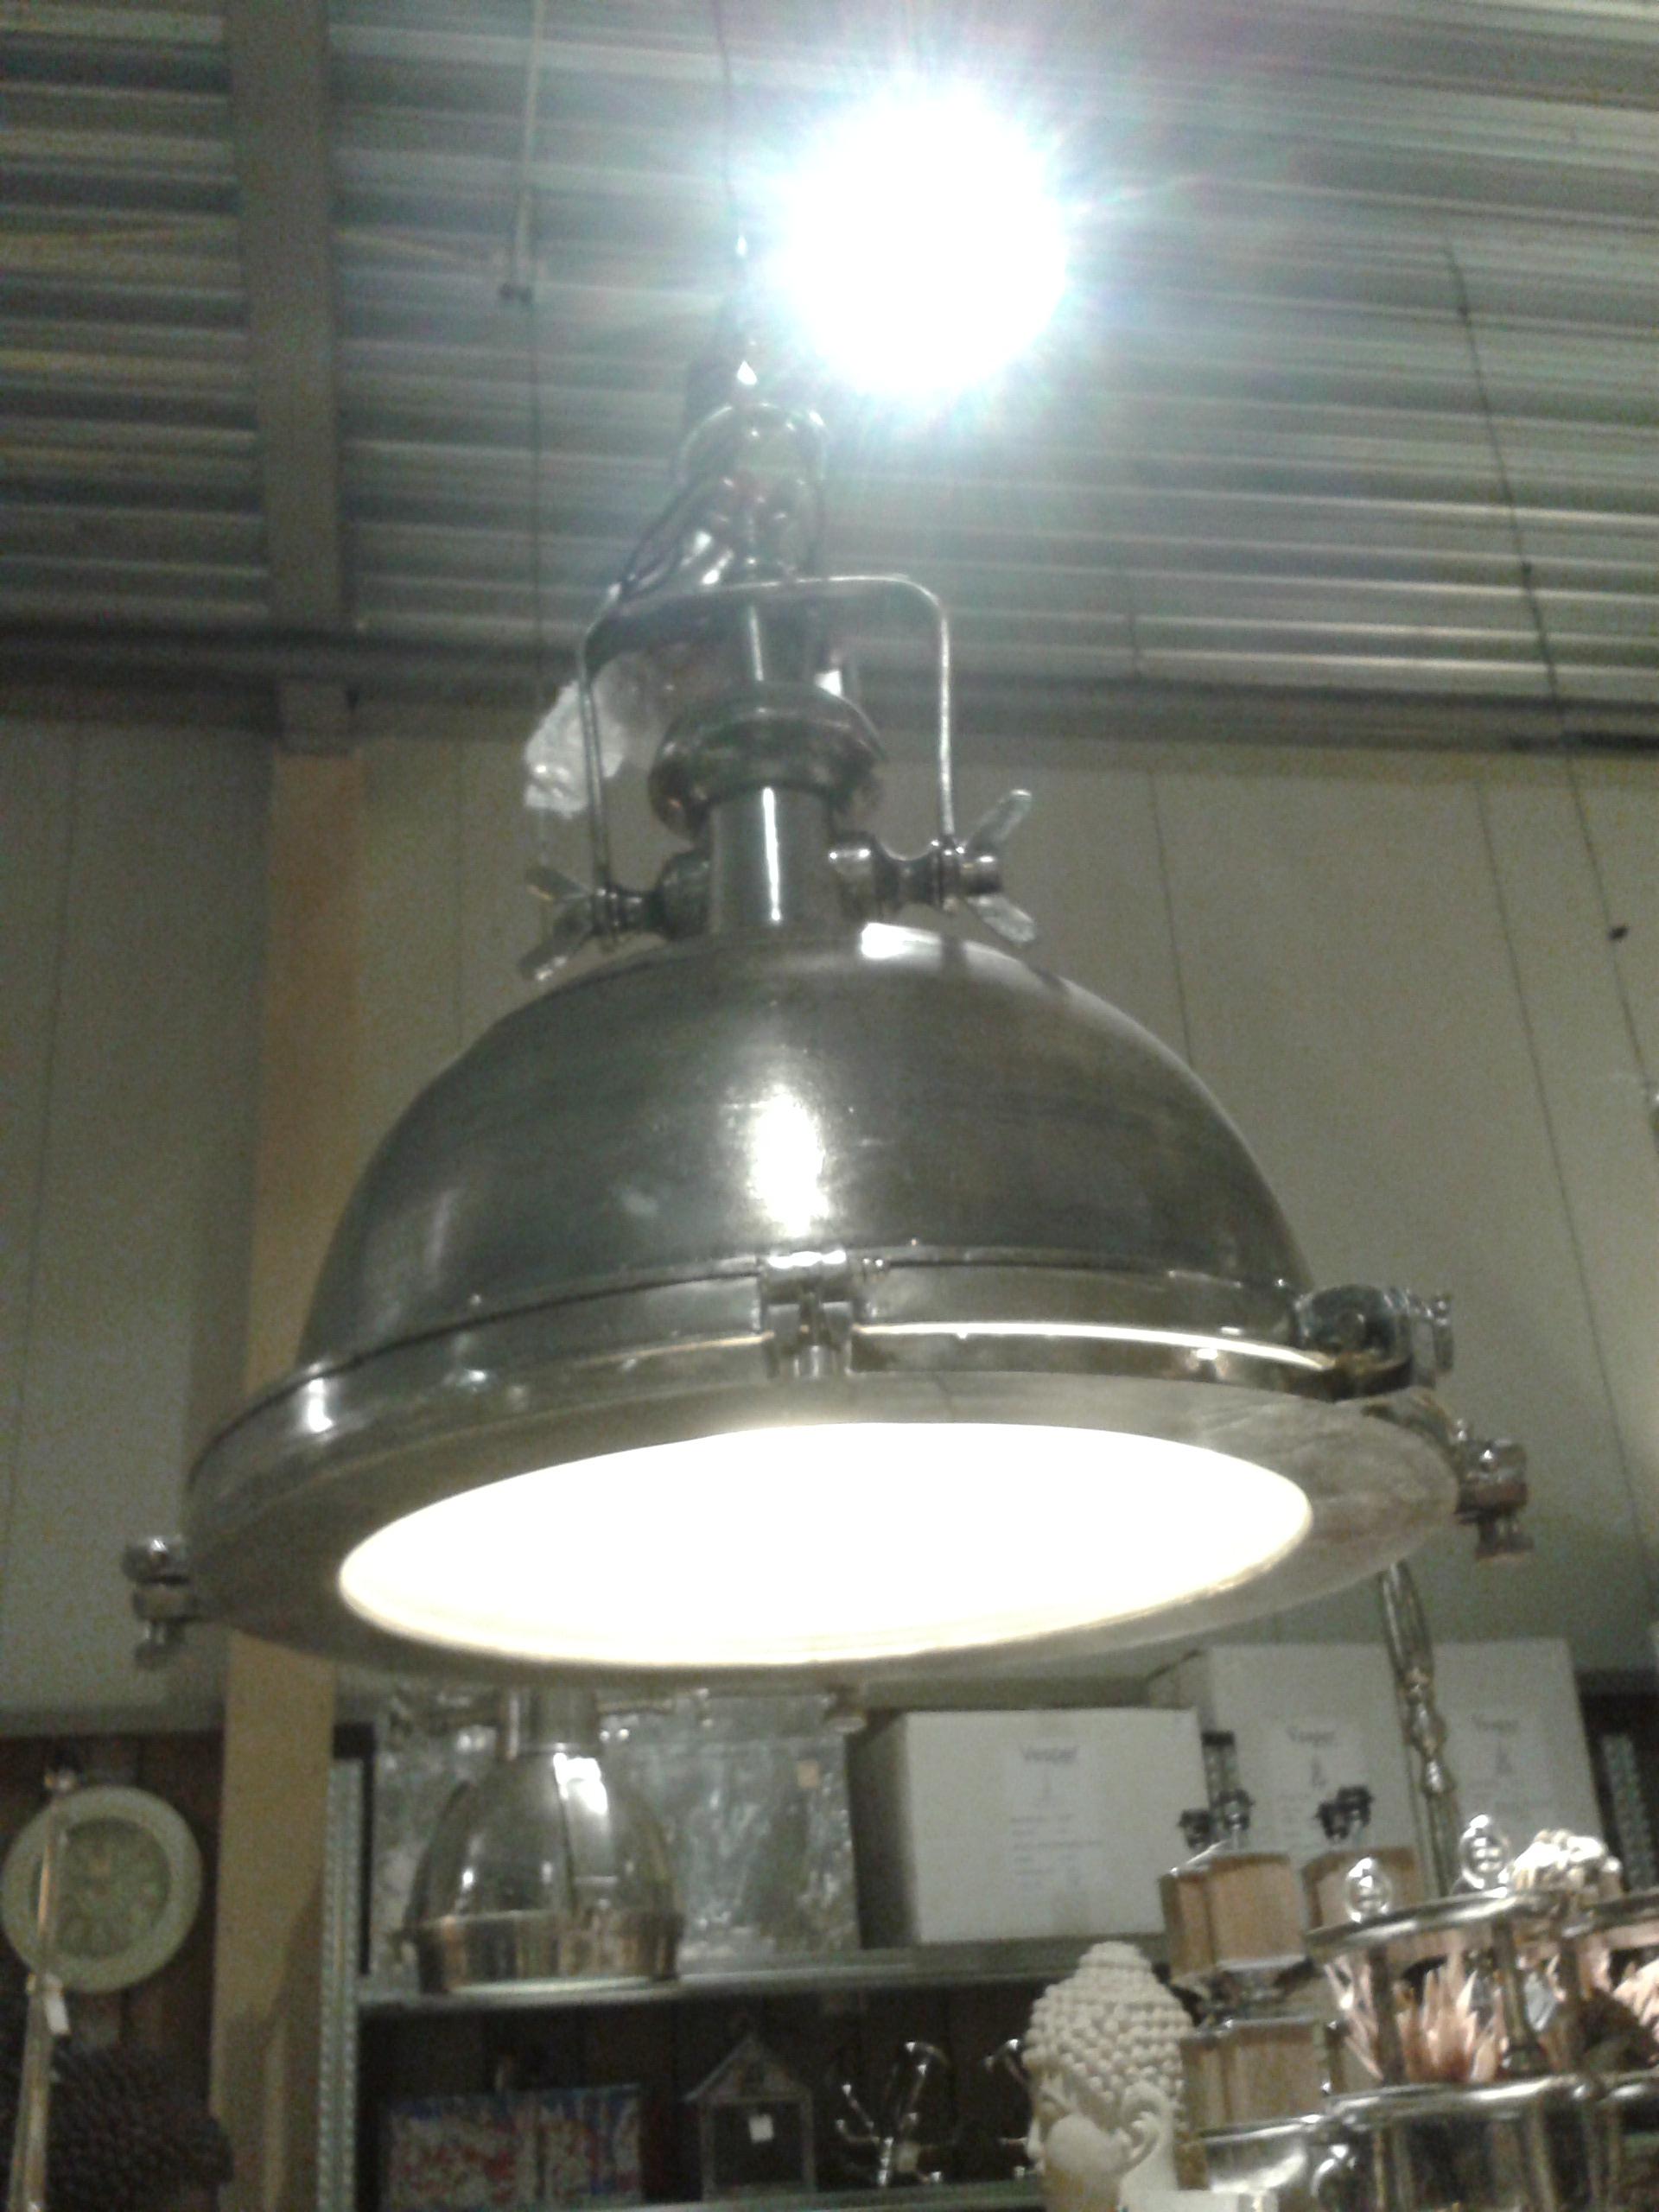 Lampen bij Woonoutlet Alkmaar  villavlusch